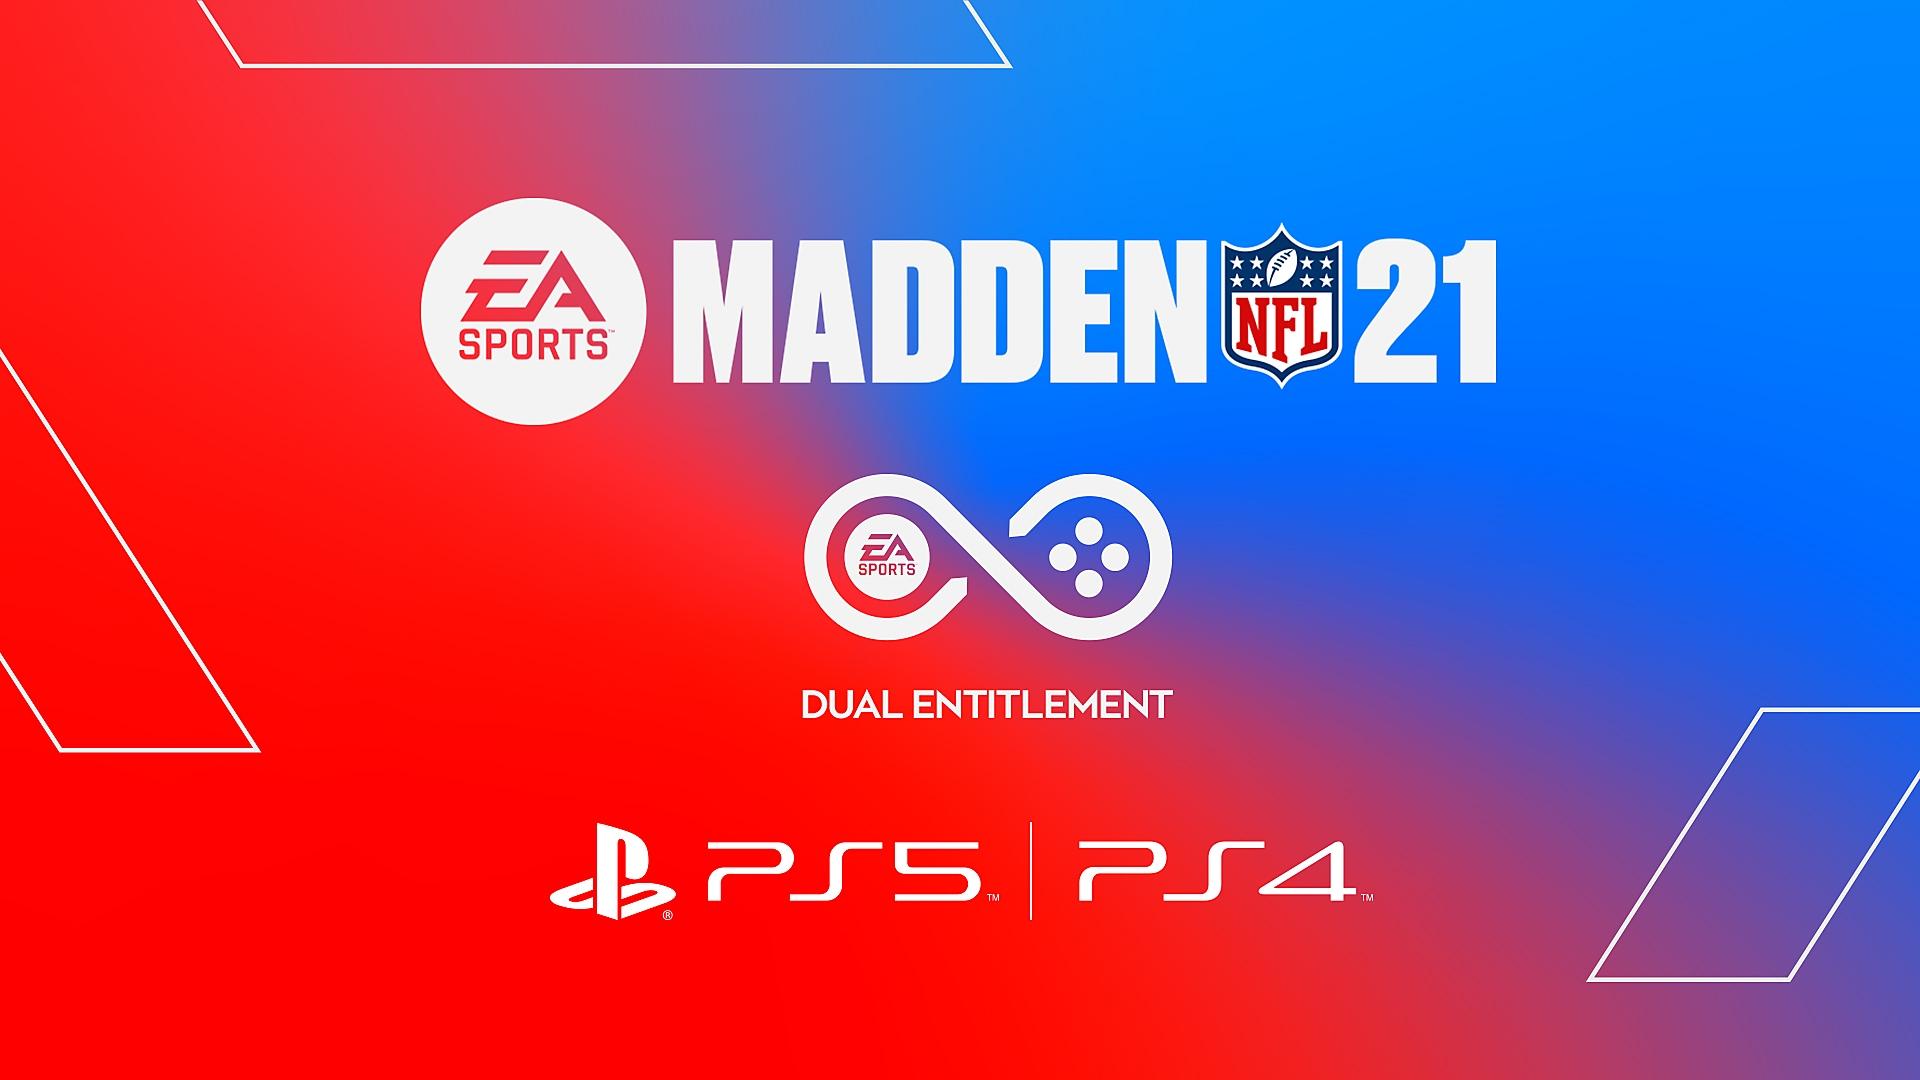 Madden NFL 21 - Dual entitlement image